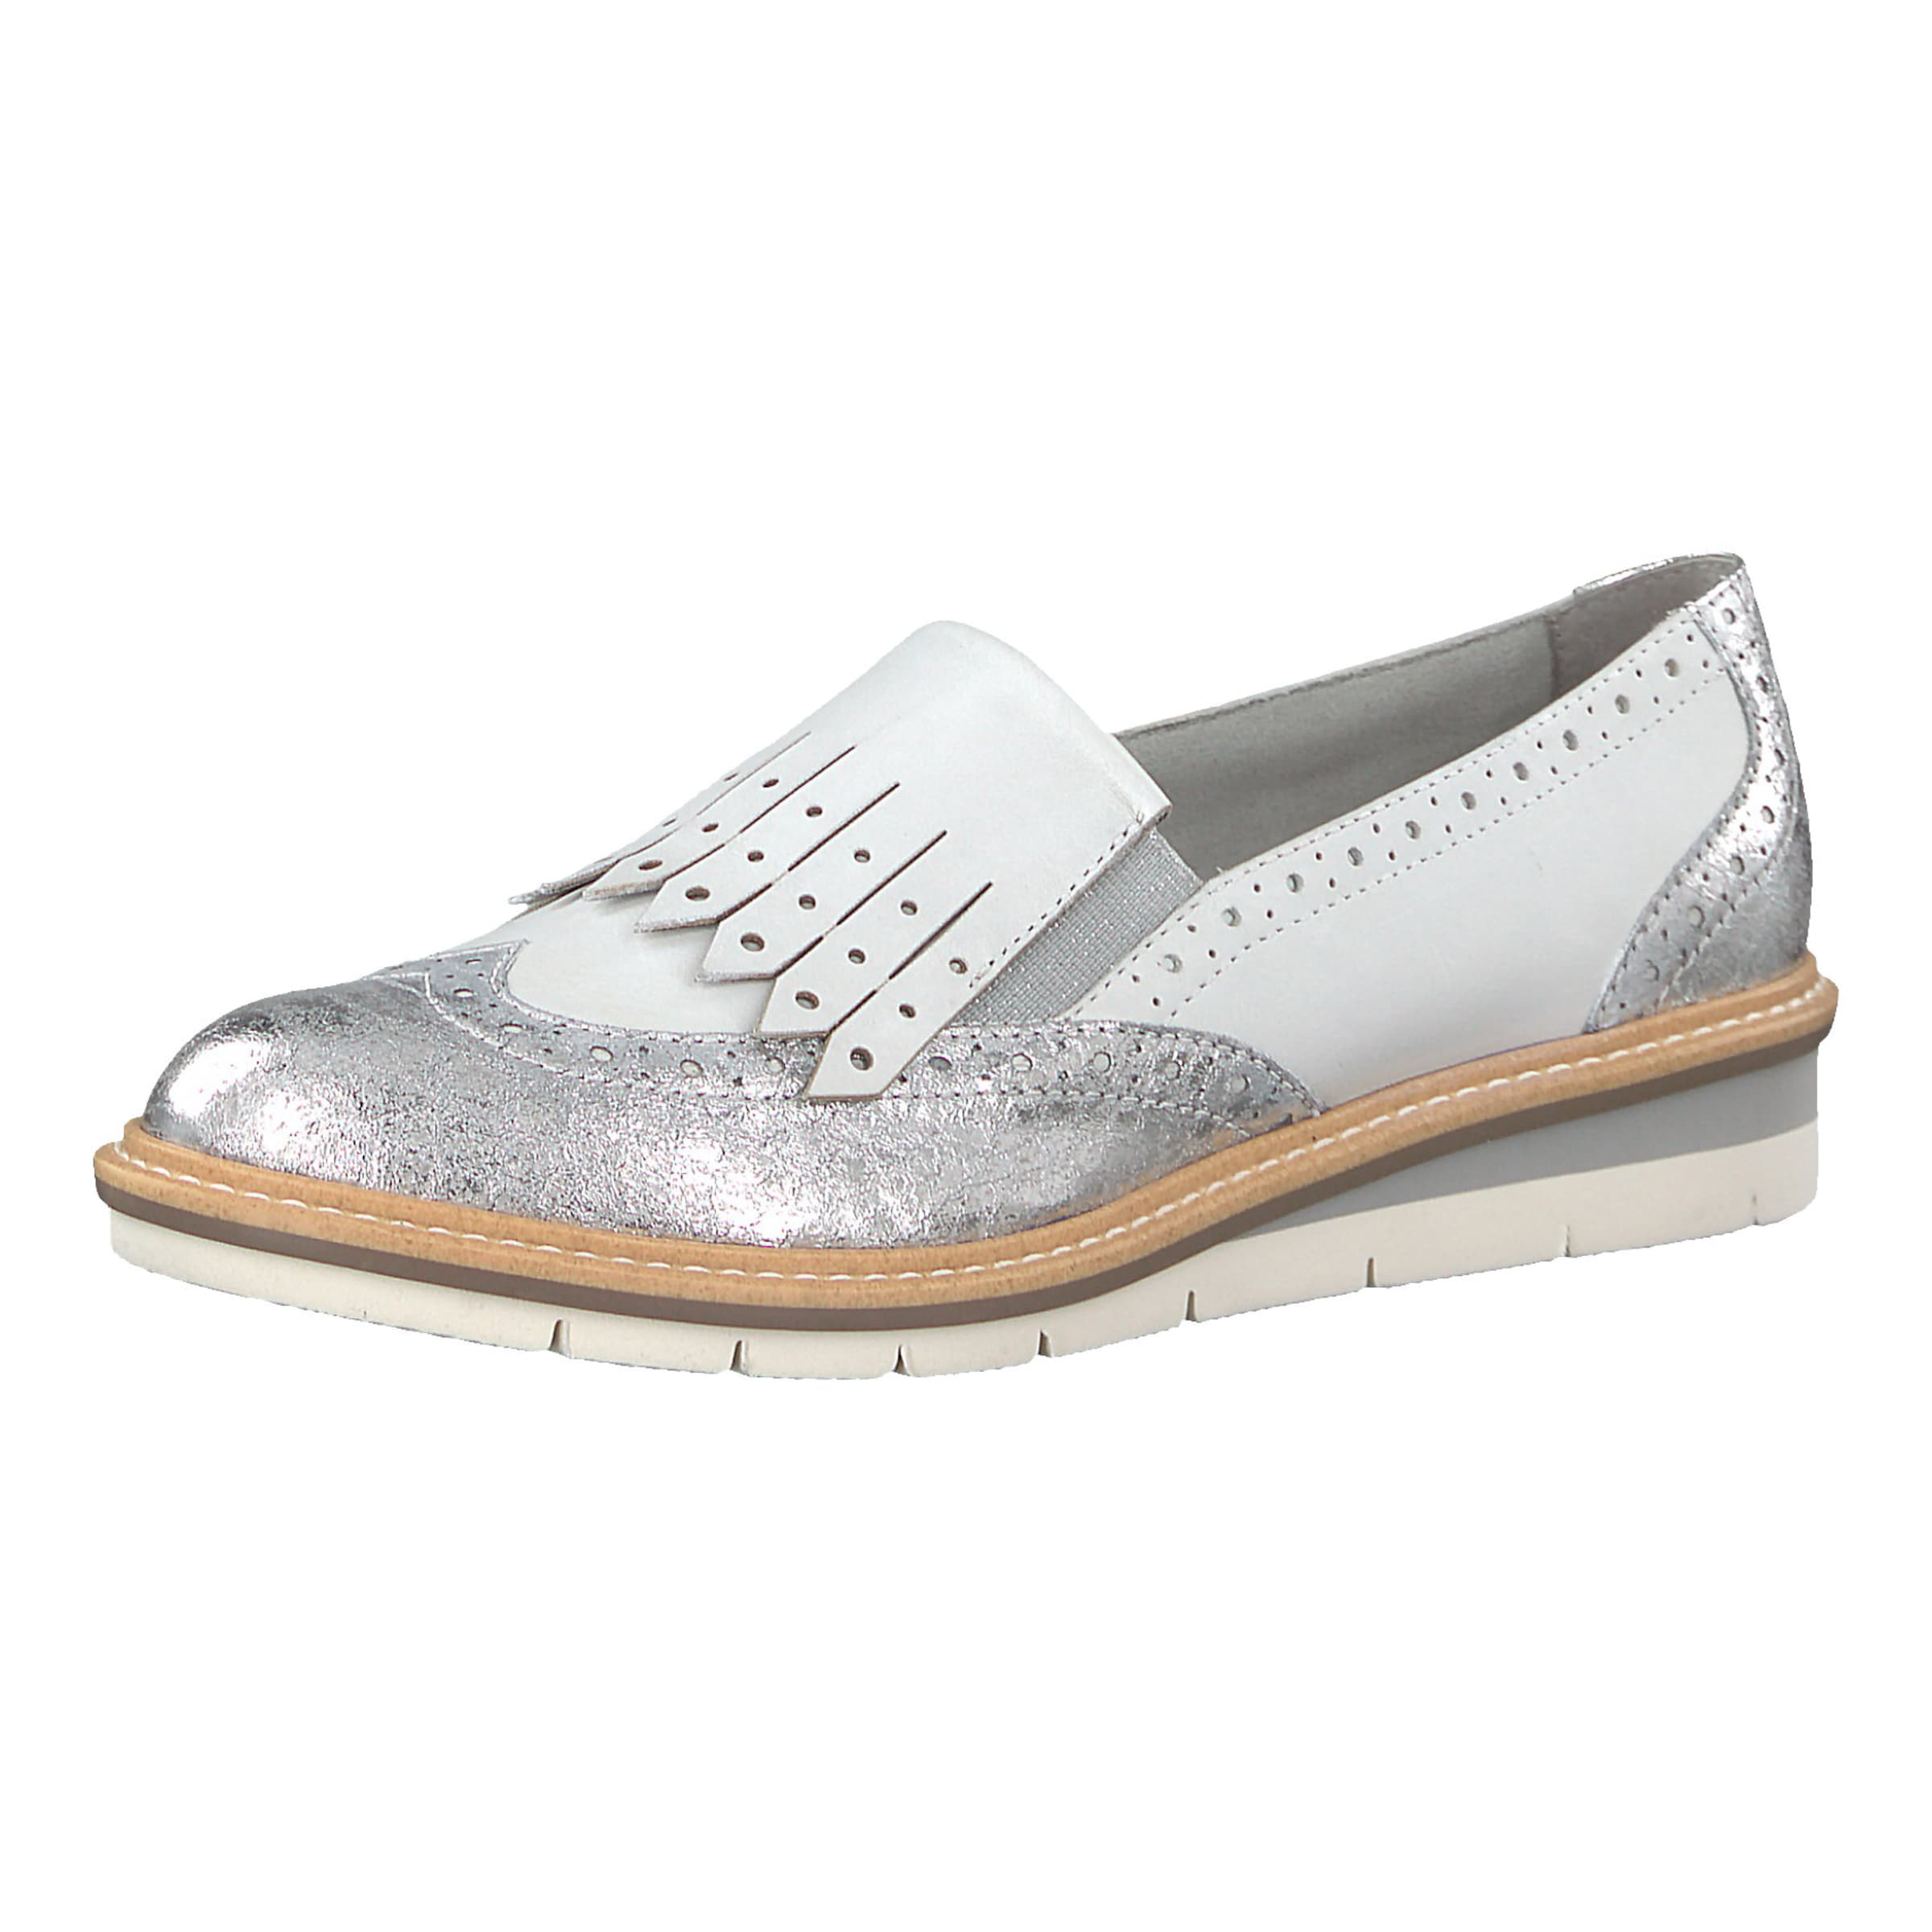 Haltbare Mode billige Schuhe TAMARIS | Slipper Schuhe Gut getragene Schuhe